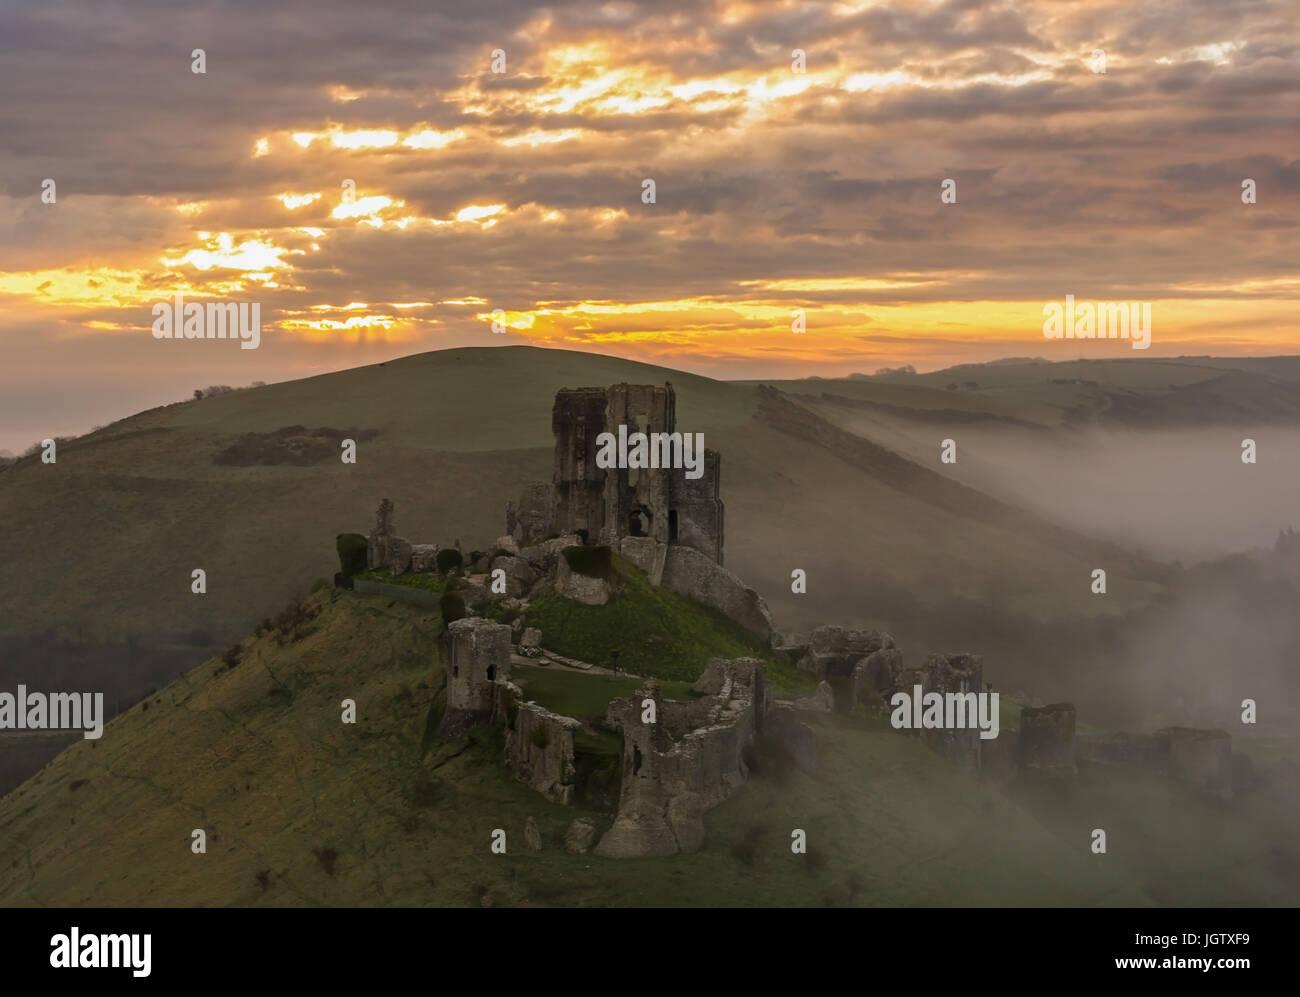 El castillo Corfe misty sunrise Imagen De Stock